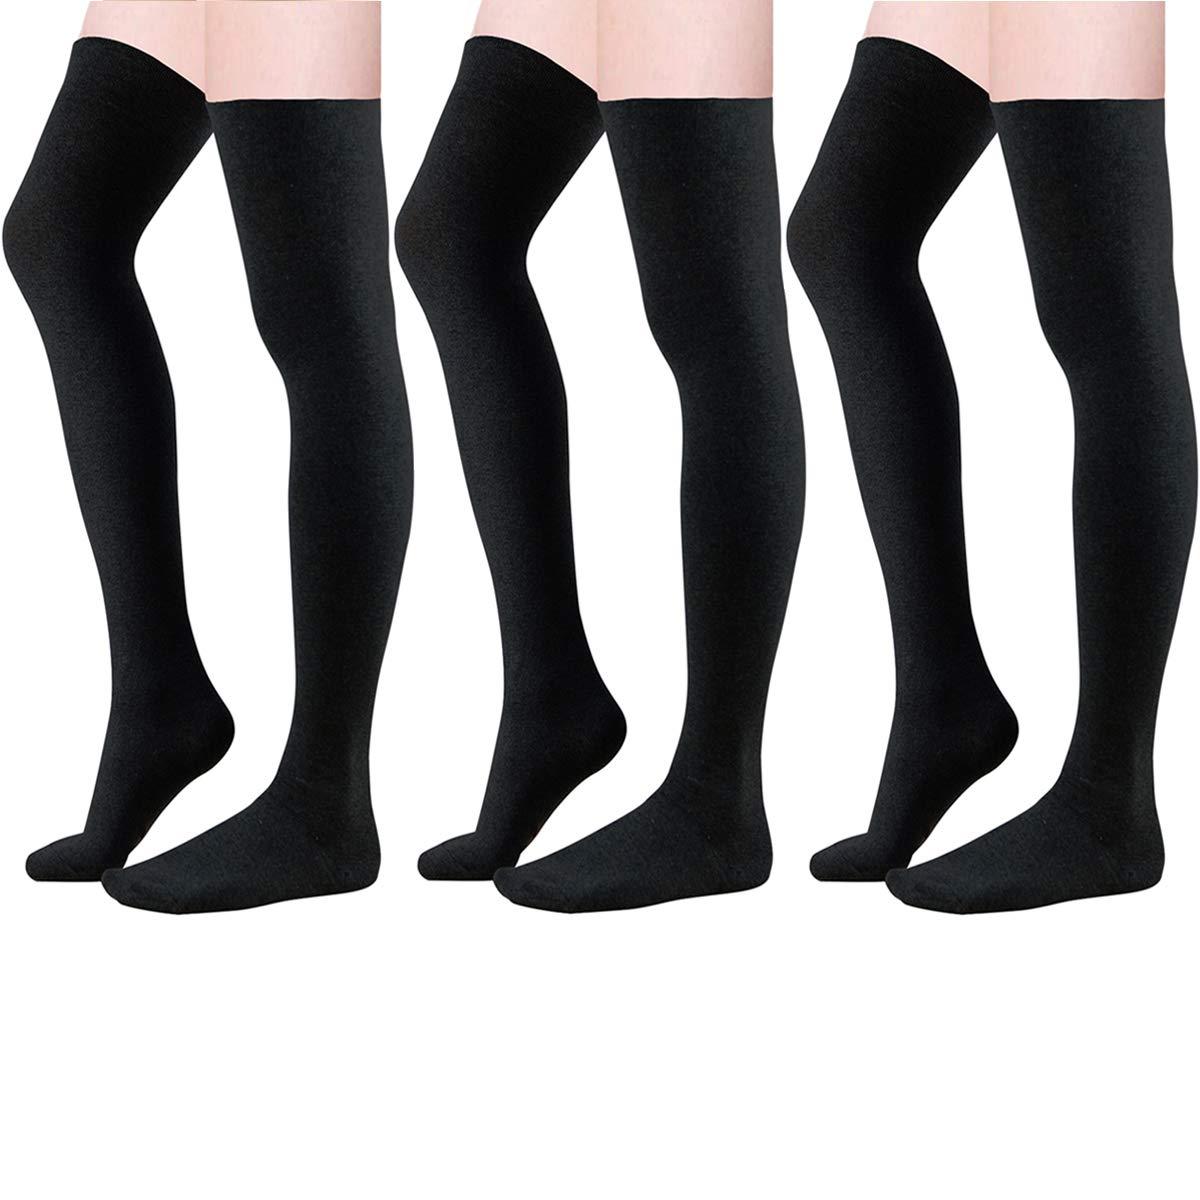 Century Star Women Girls Basic Classical Cosplay Knit Long Knitted Basic Thigh High Stocking Socks 3 Pairs Black